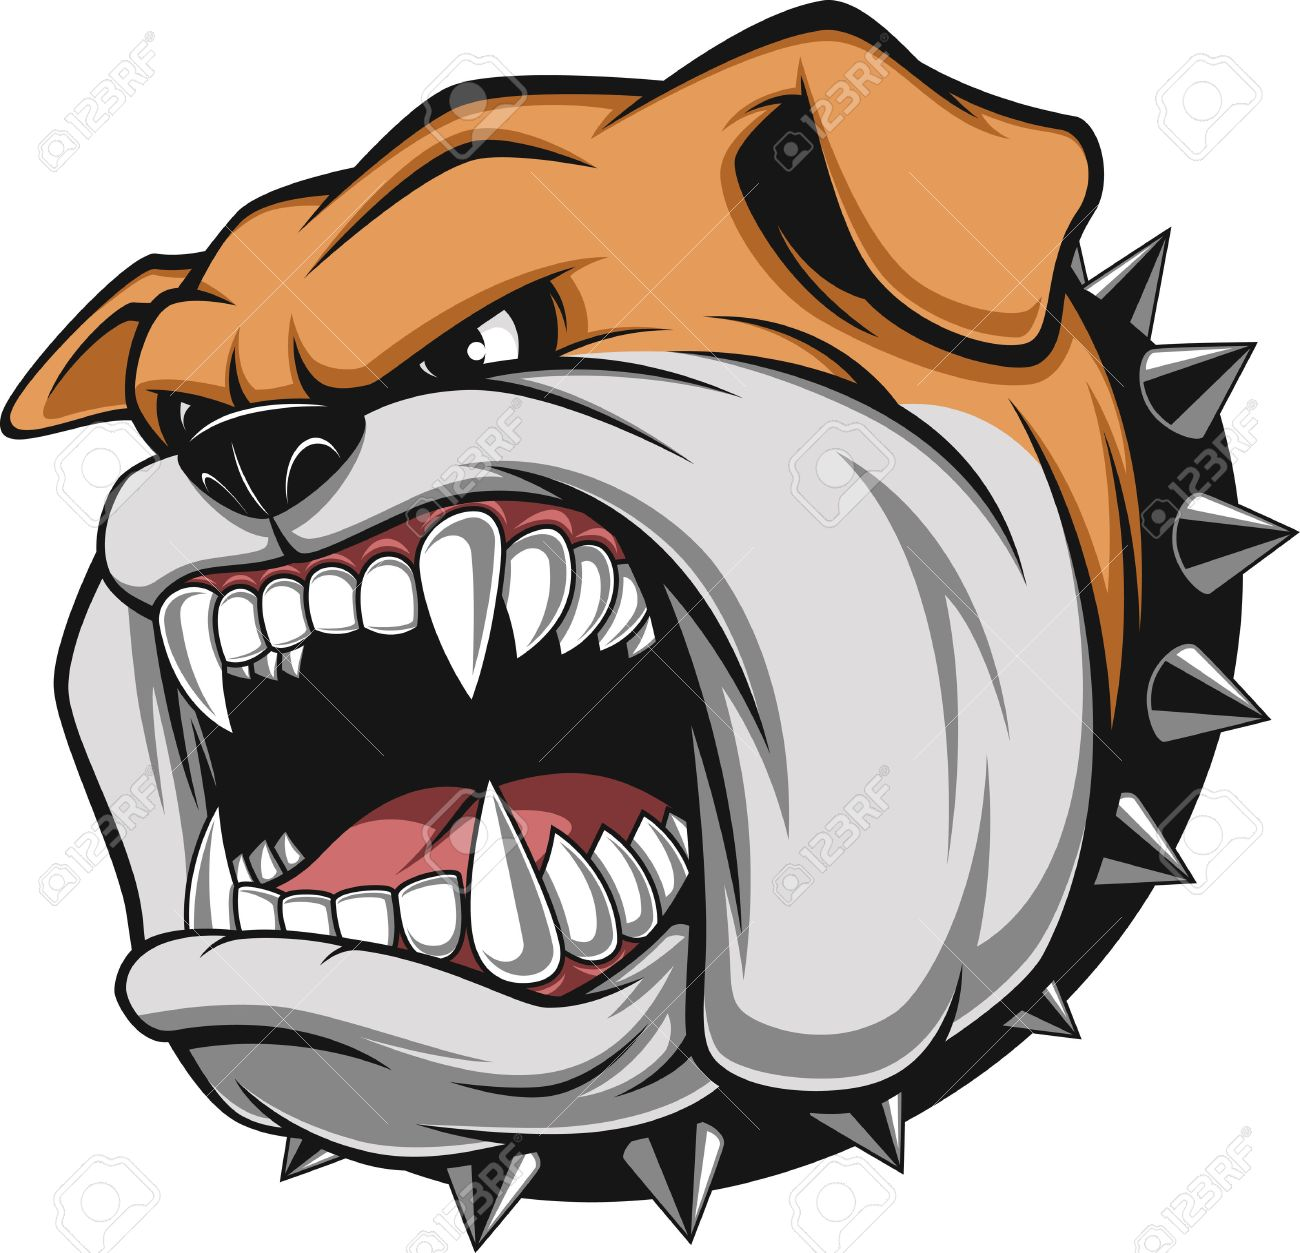 12073 Bulldog Stock Vector Illustration And Royalty Free Bulldog